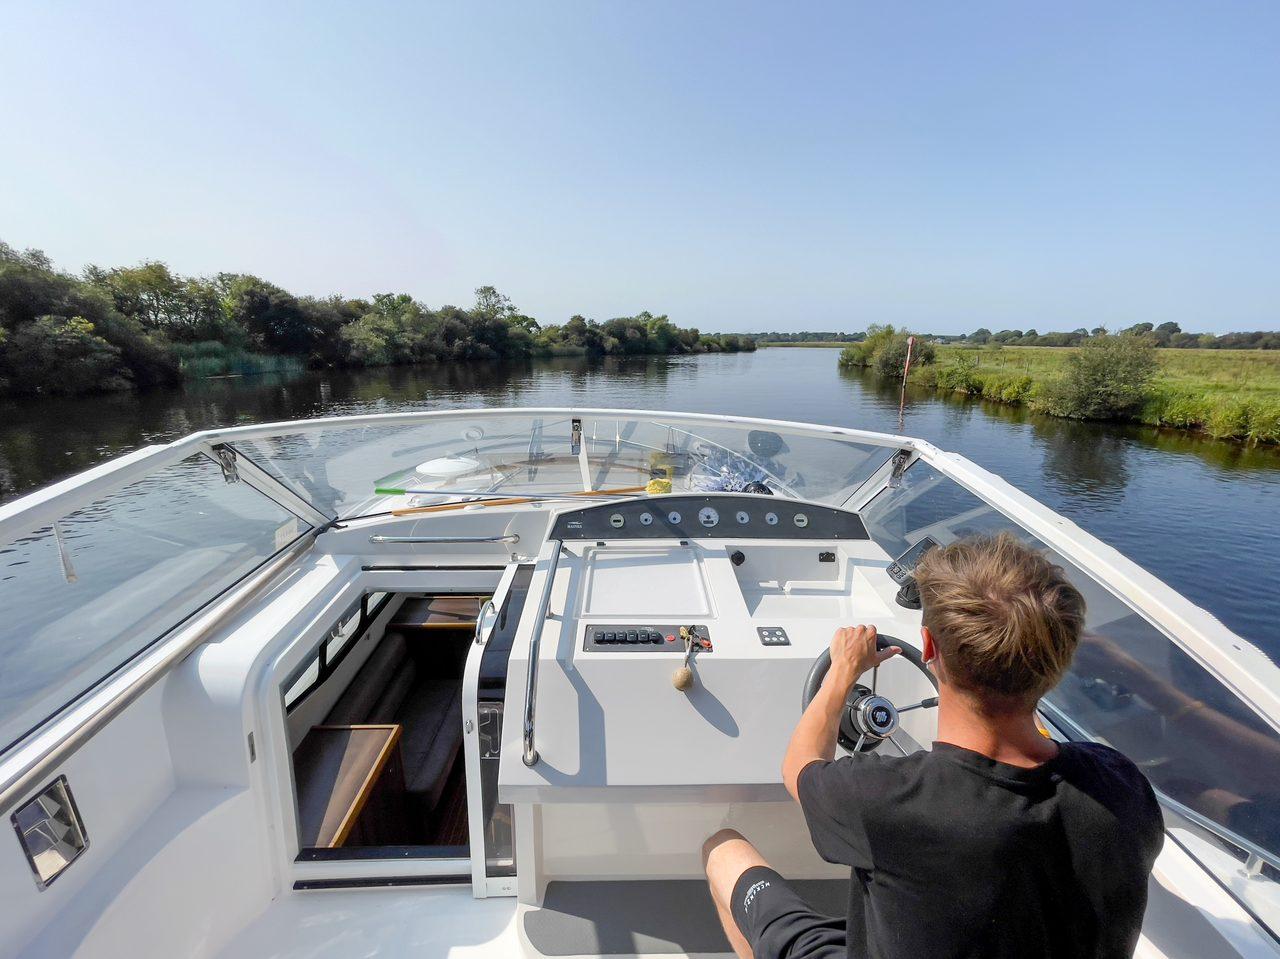 Plant community, Naval architecture, Water, Boat, Sky, Watercraft, Vehicle, Lake, Tree